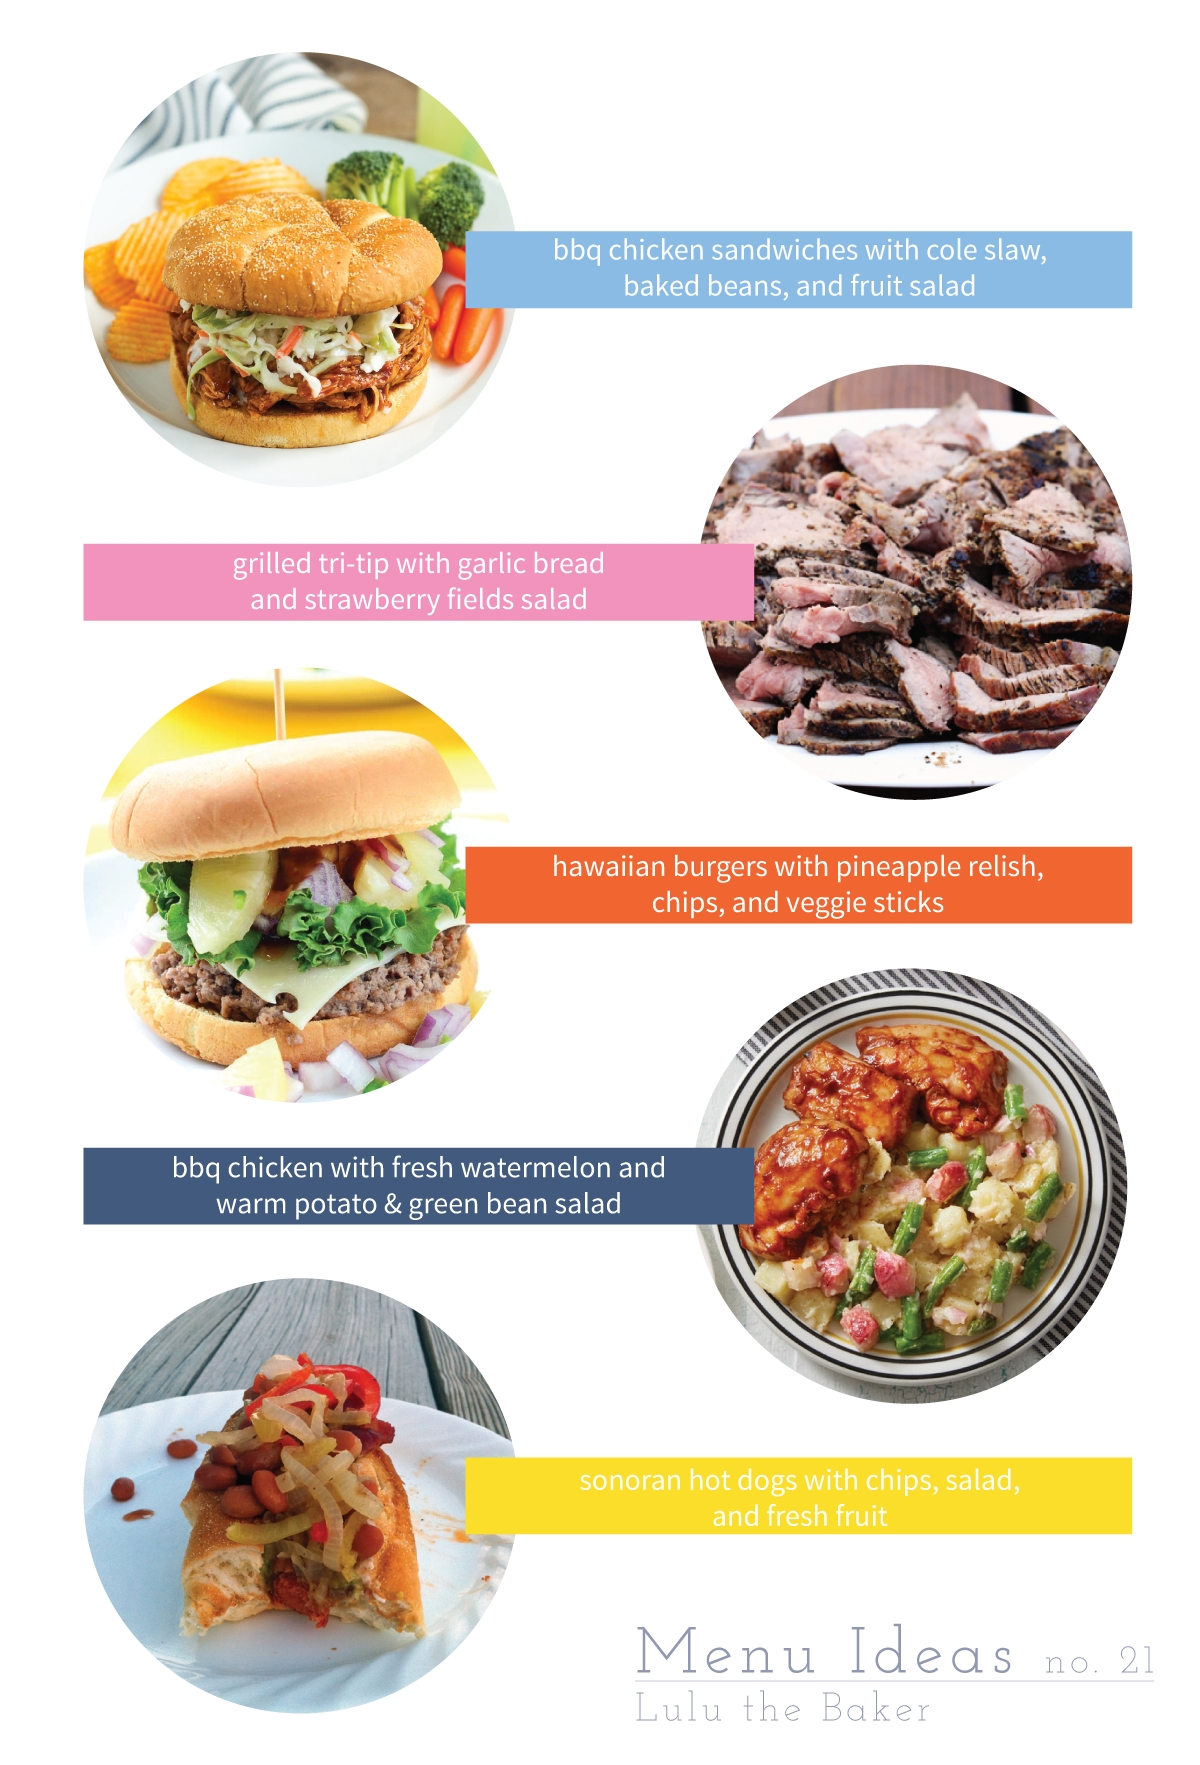 10 Beautiful Fourth Of July Menu Ideas menu ideas 21 fourth of july favorites lulu the baker 1 2021